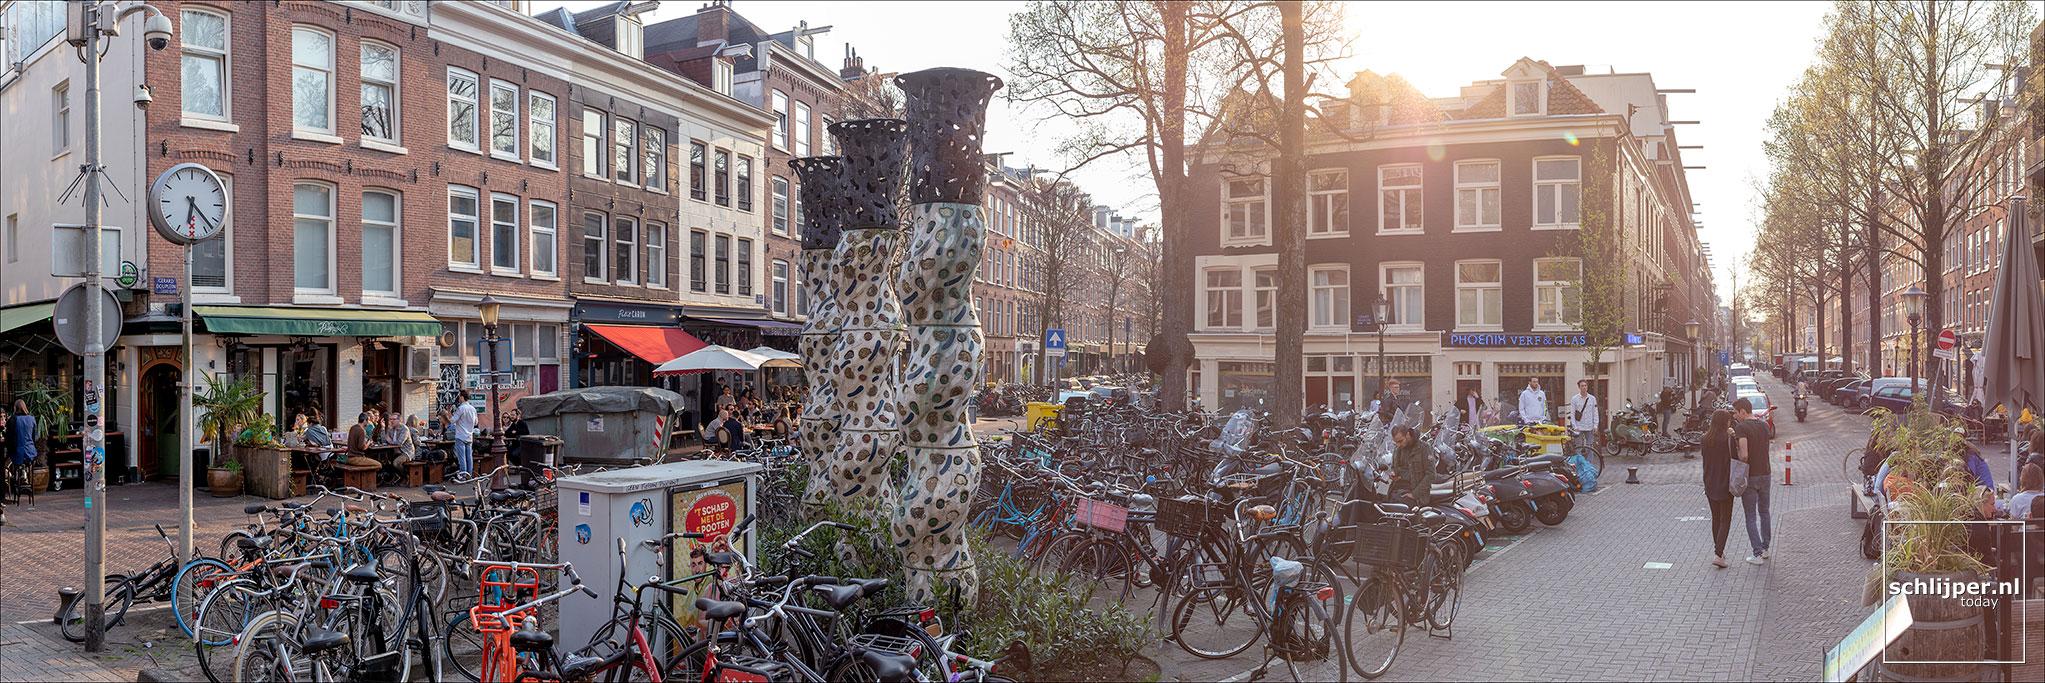 Nederland, Amsterdam, 7 april 2019